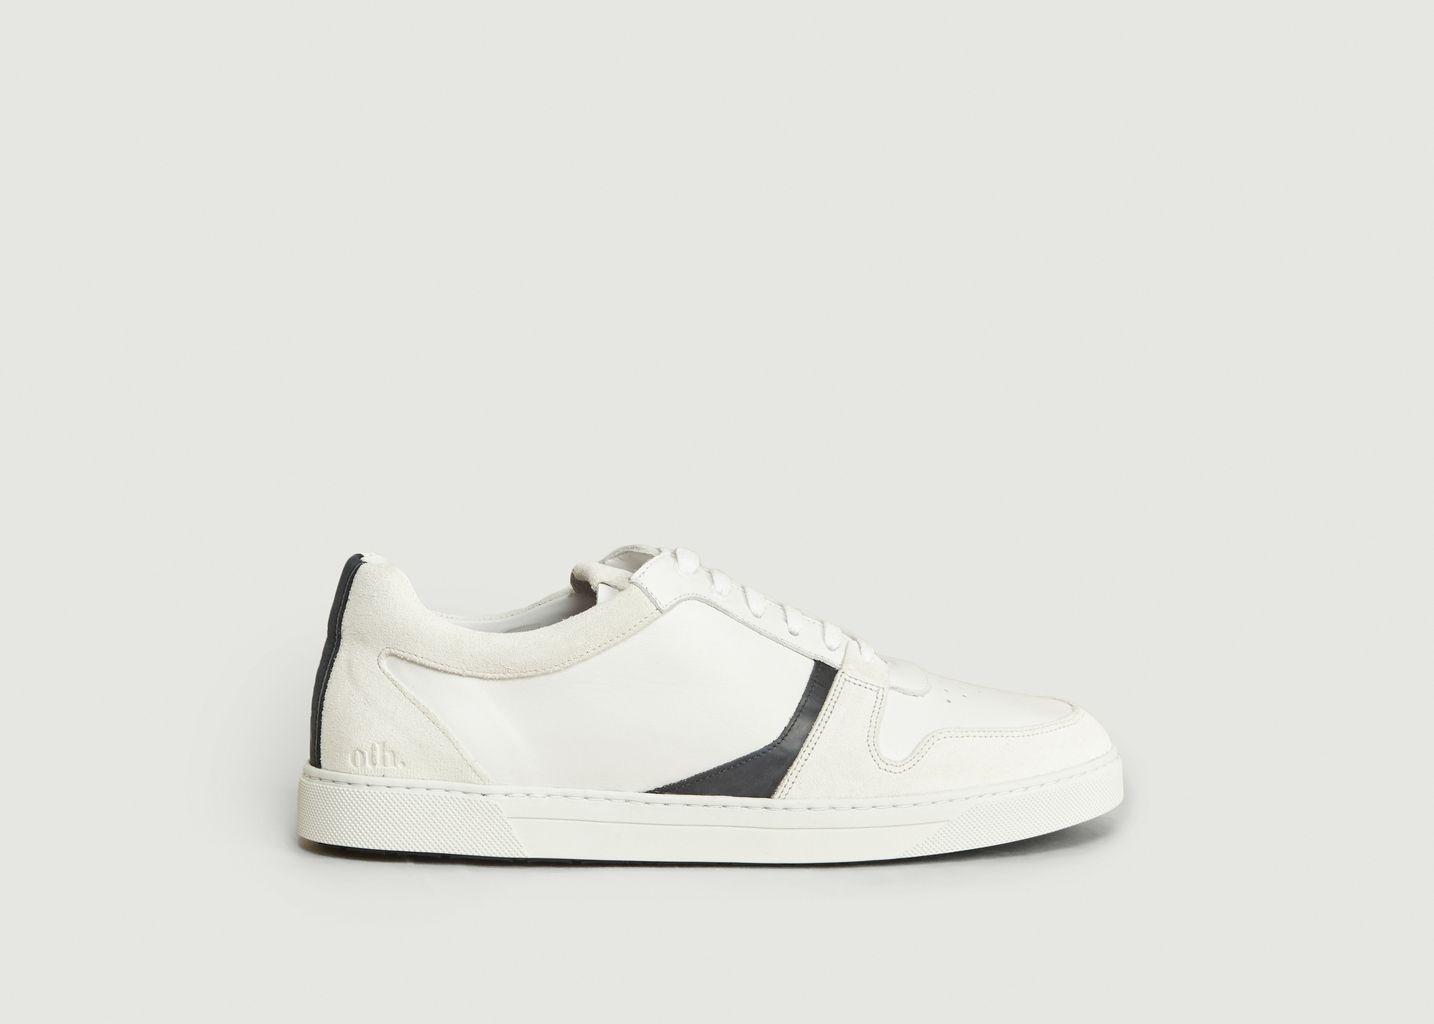 Sneakers Glencoe - Oth.